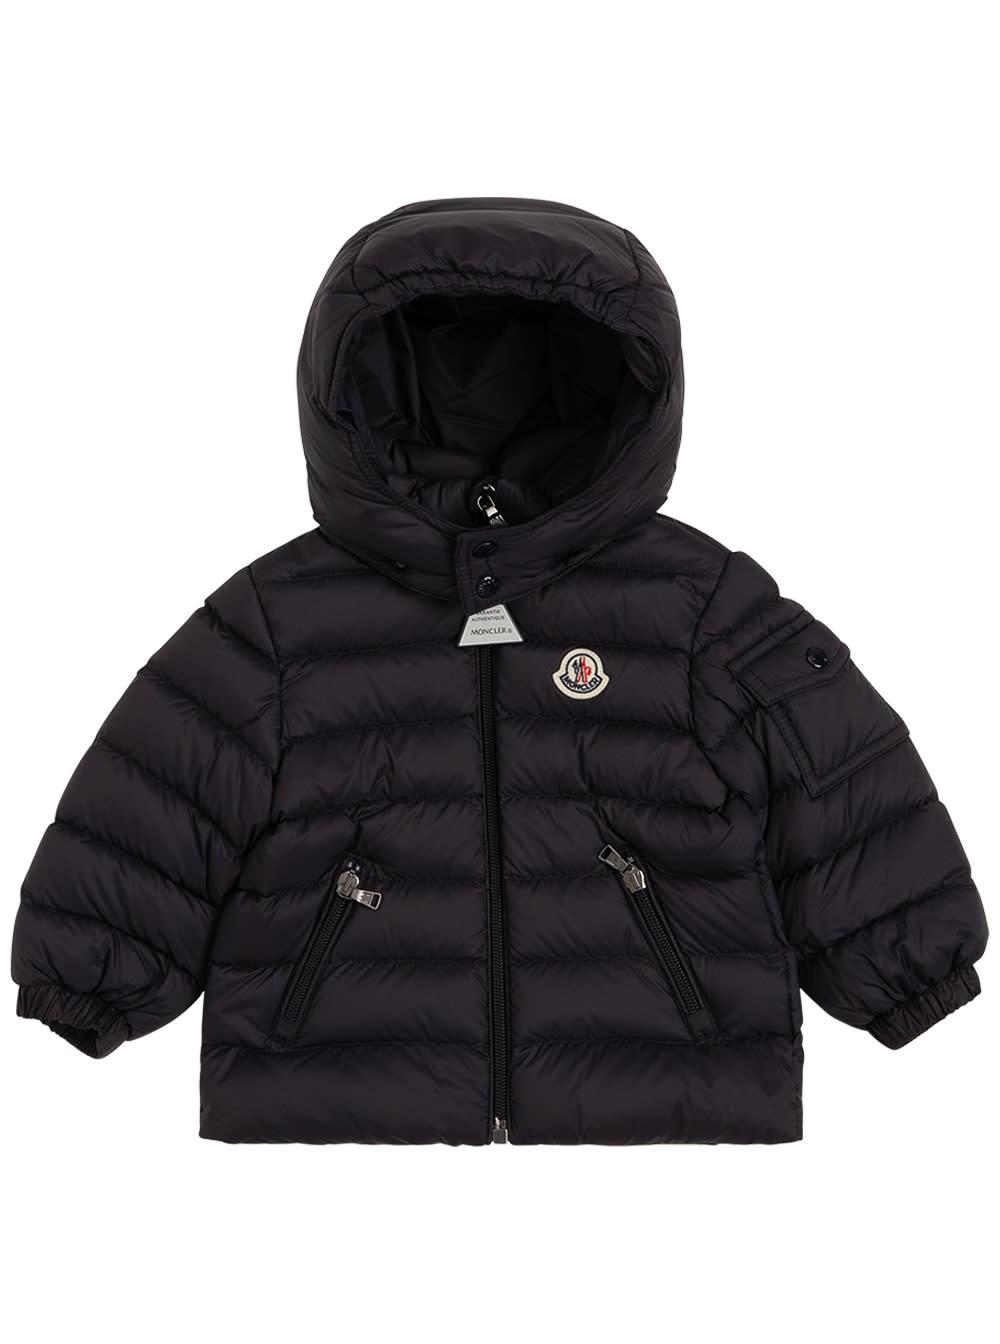 Moncler Black Nylon Down Jacket With Logo Patch